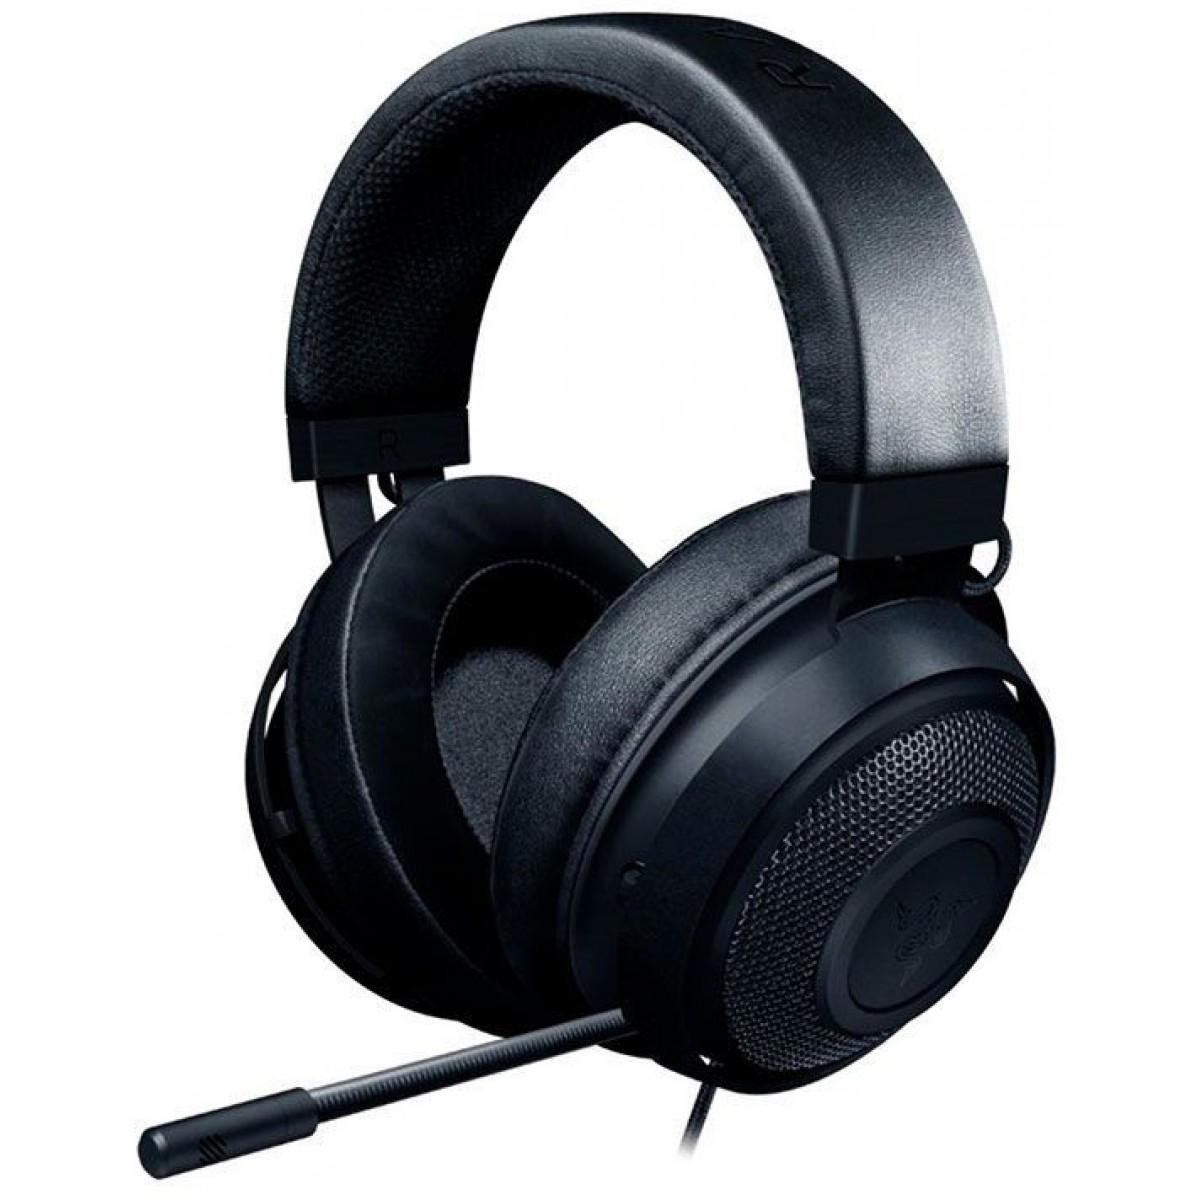 Headset Gamer Razer Kraken, Xbox One, PS4, Switch, PC, Black